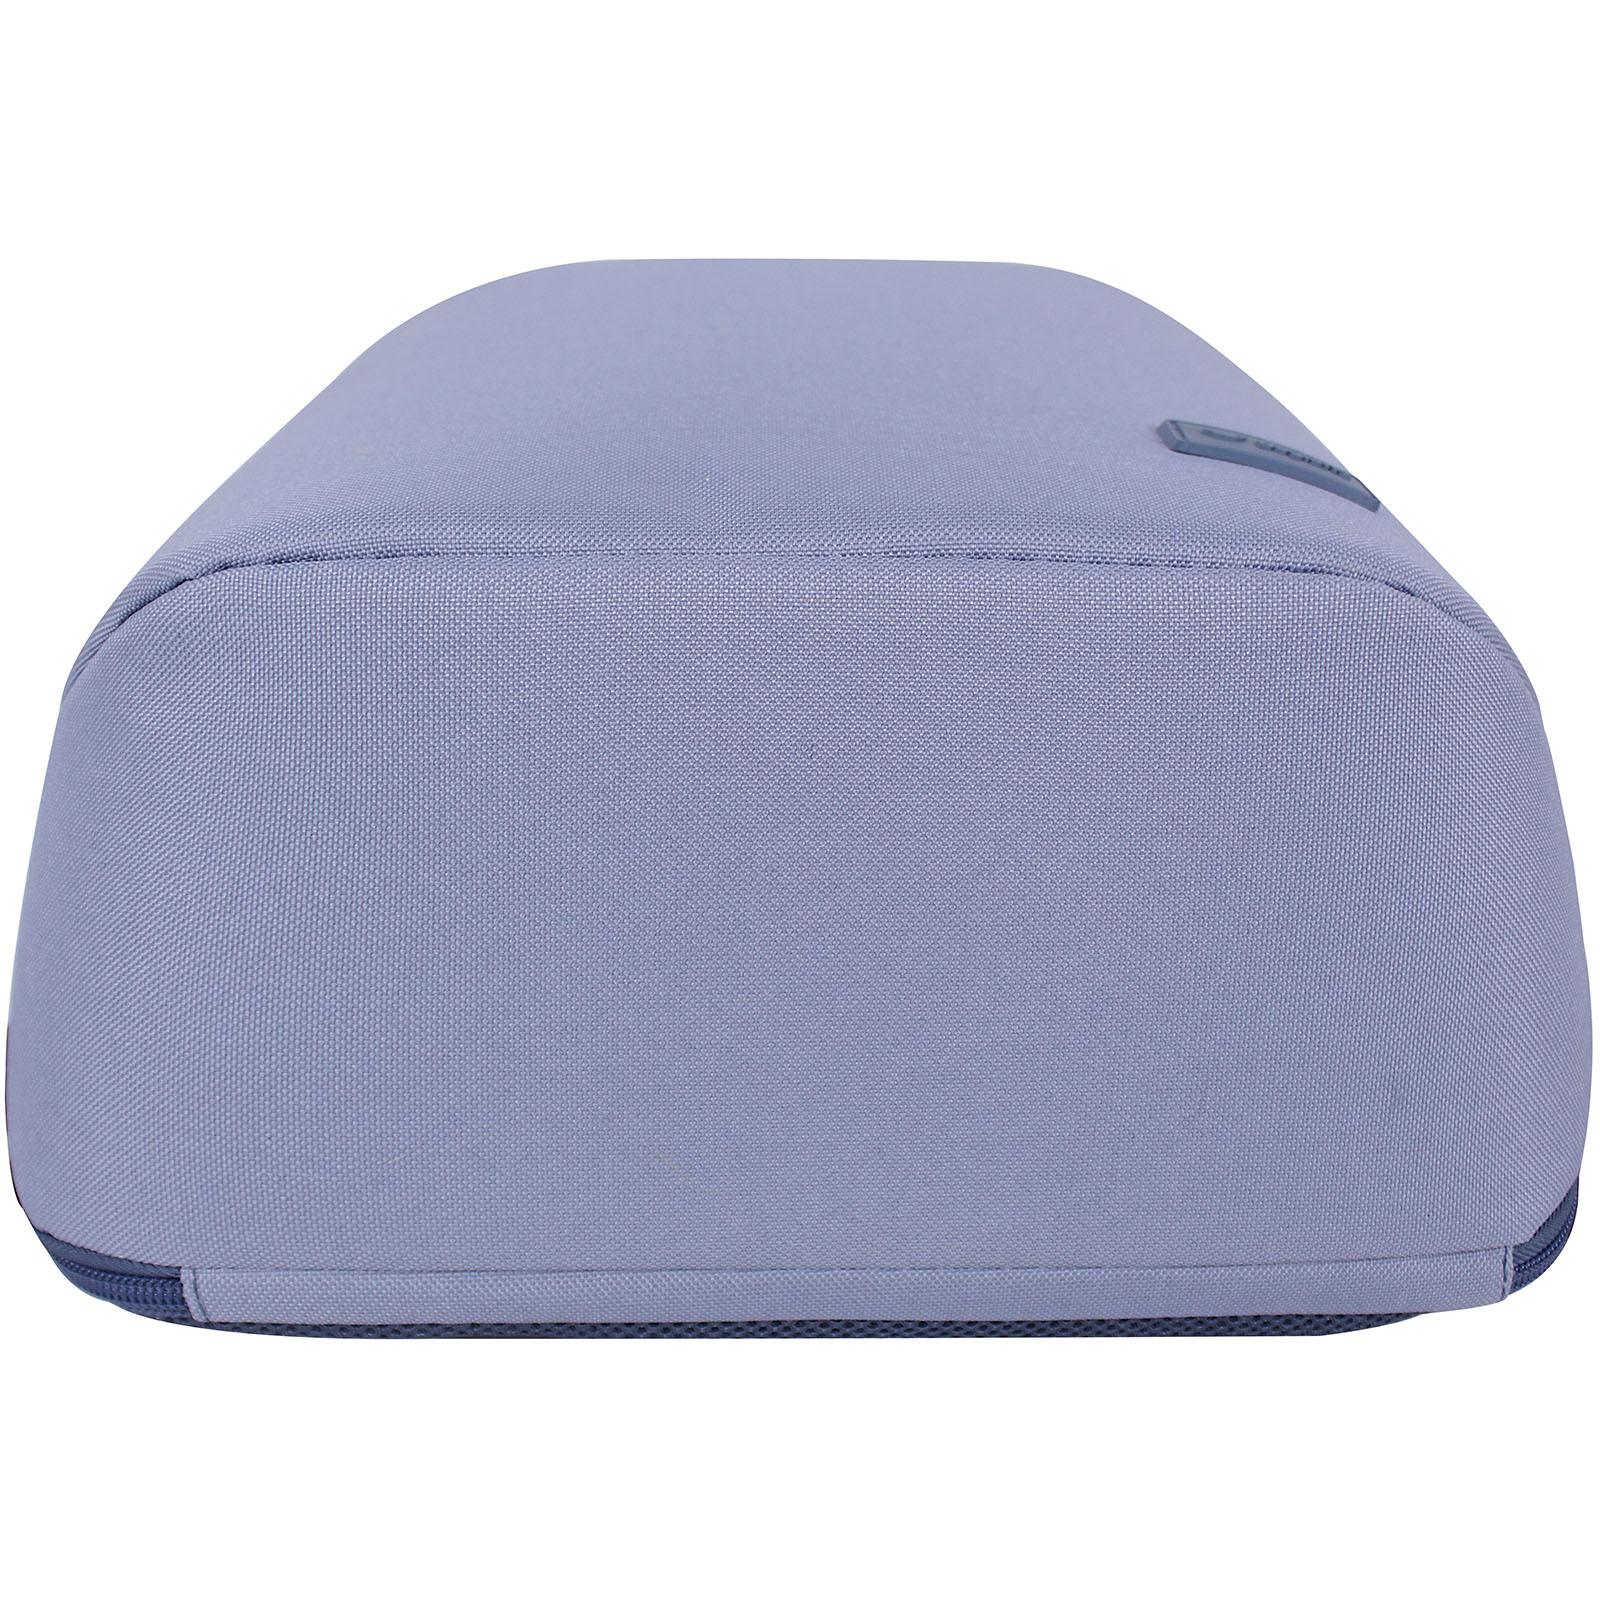 Рюкзак для ноутбука Bagland Shine 16 л. Серый (0058166) фото 5